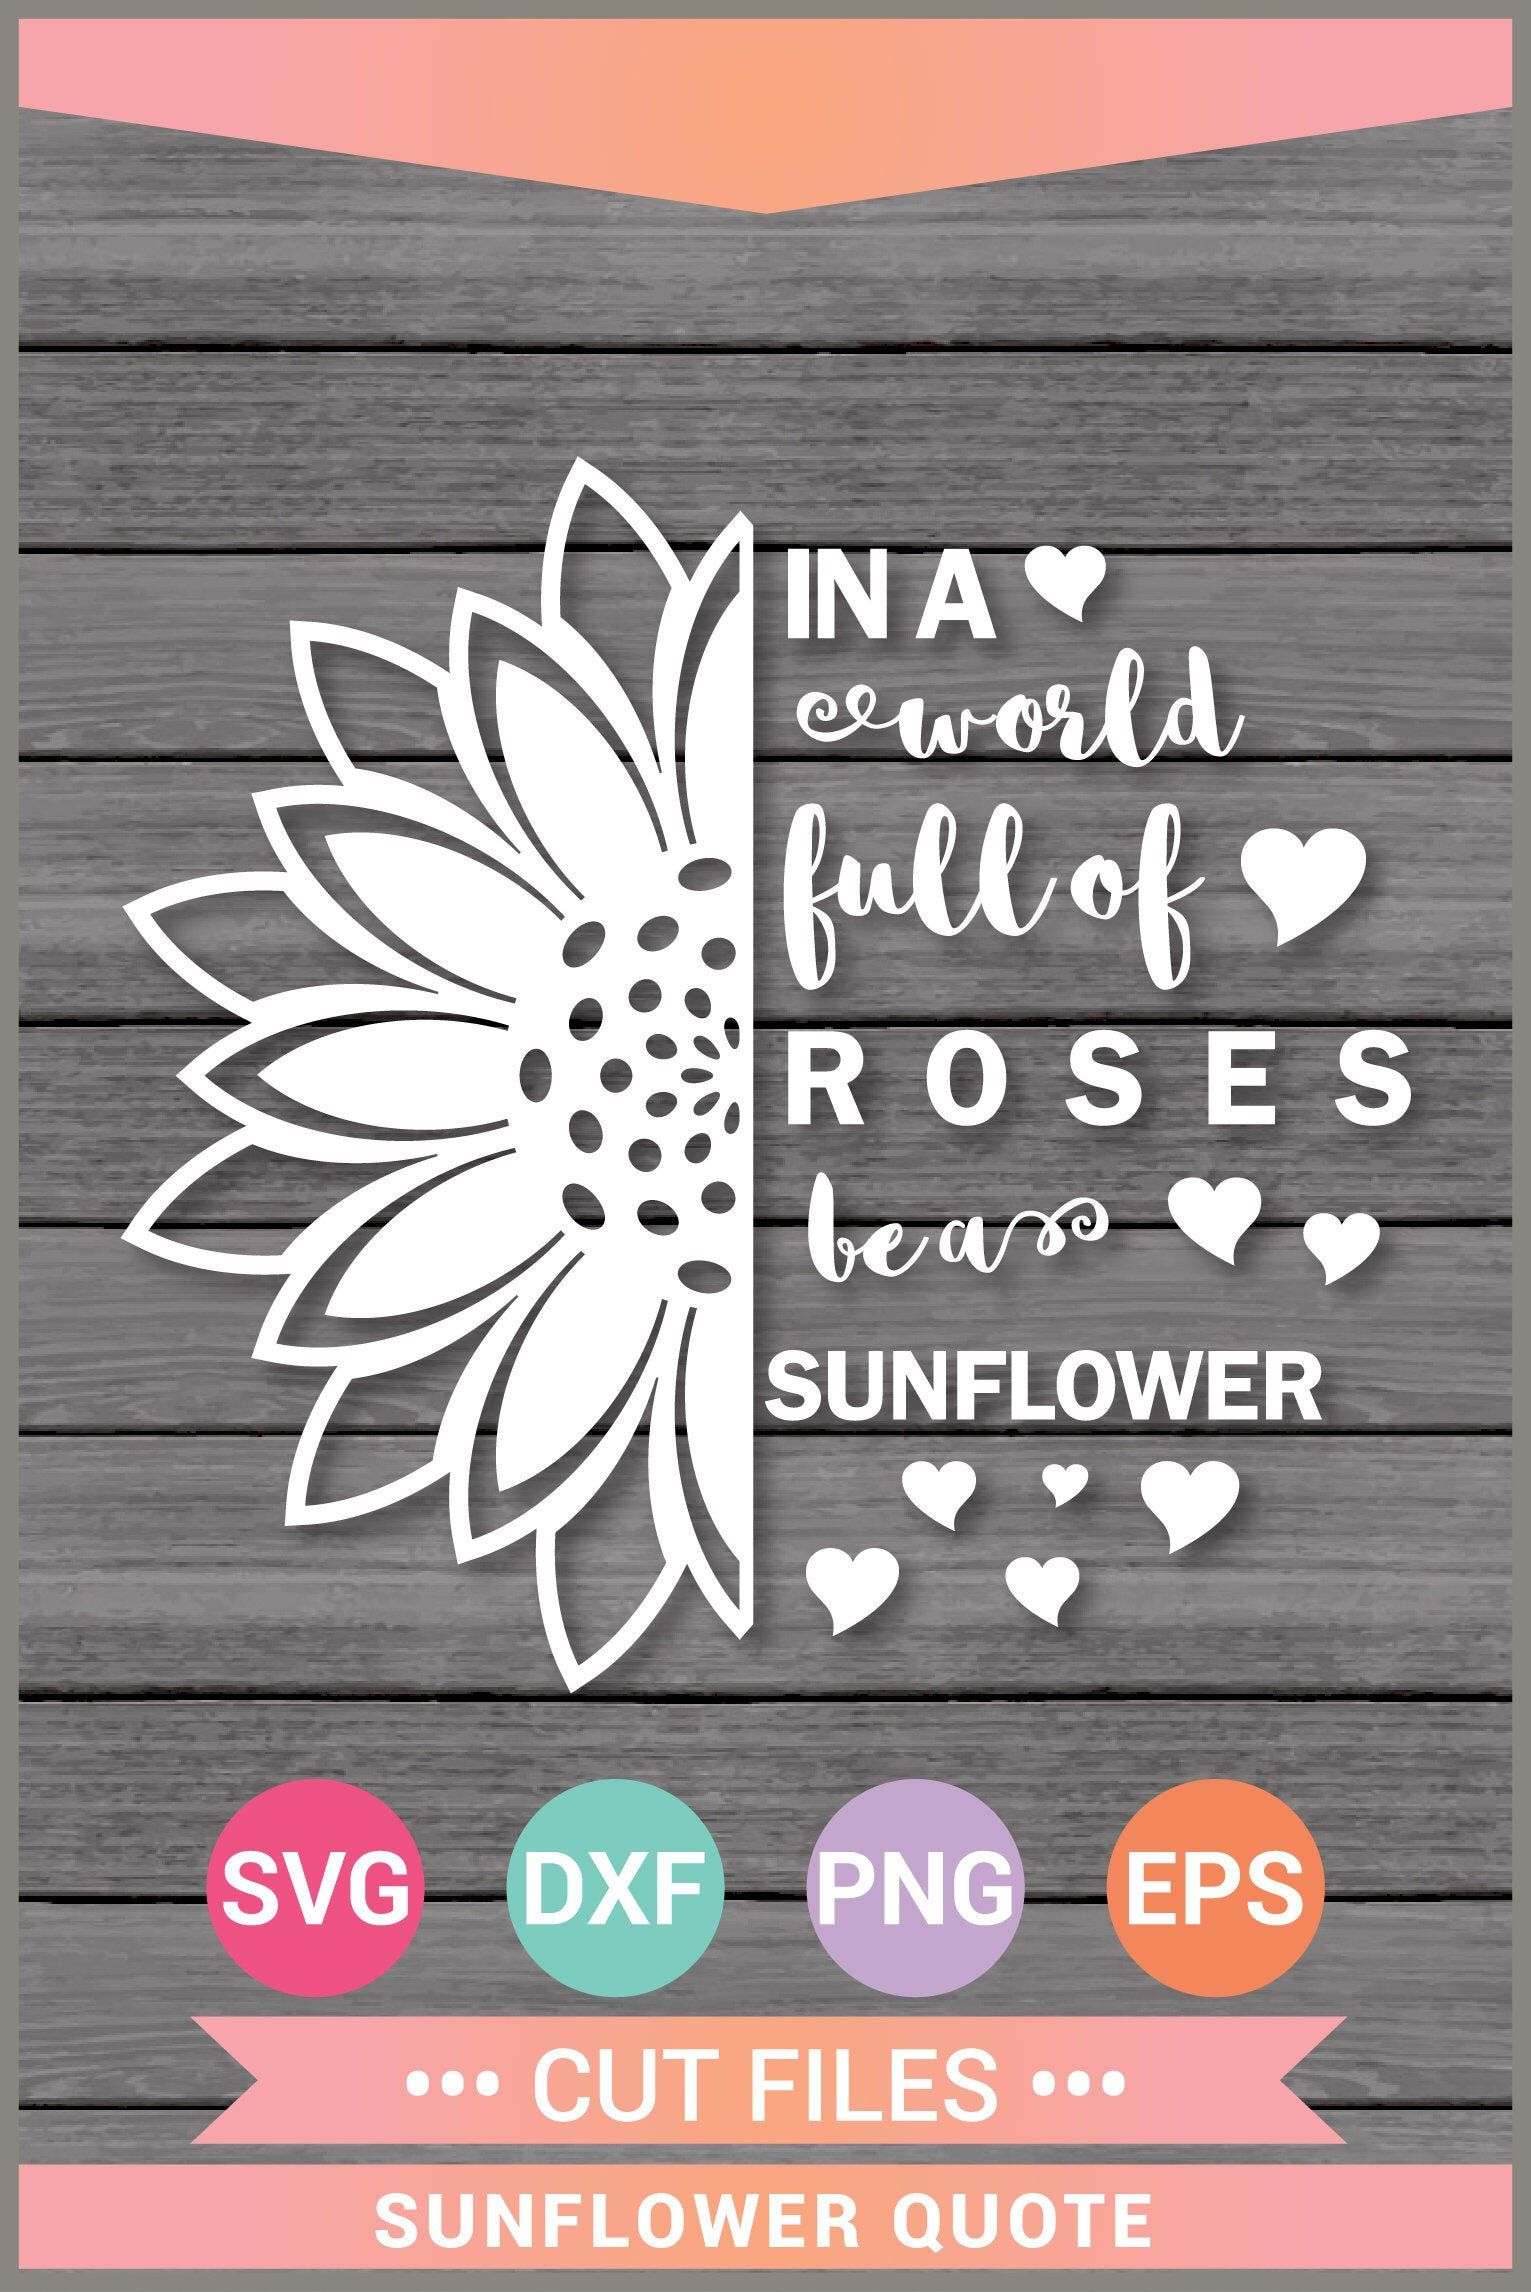 Be a Sunflower SVG, Quote svg, Sunflower Vinyl, Cricut Cut Files, Cricut Design Space, Silhouette,Instant Download,Svg, Png, Eps, Dxf CF-063